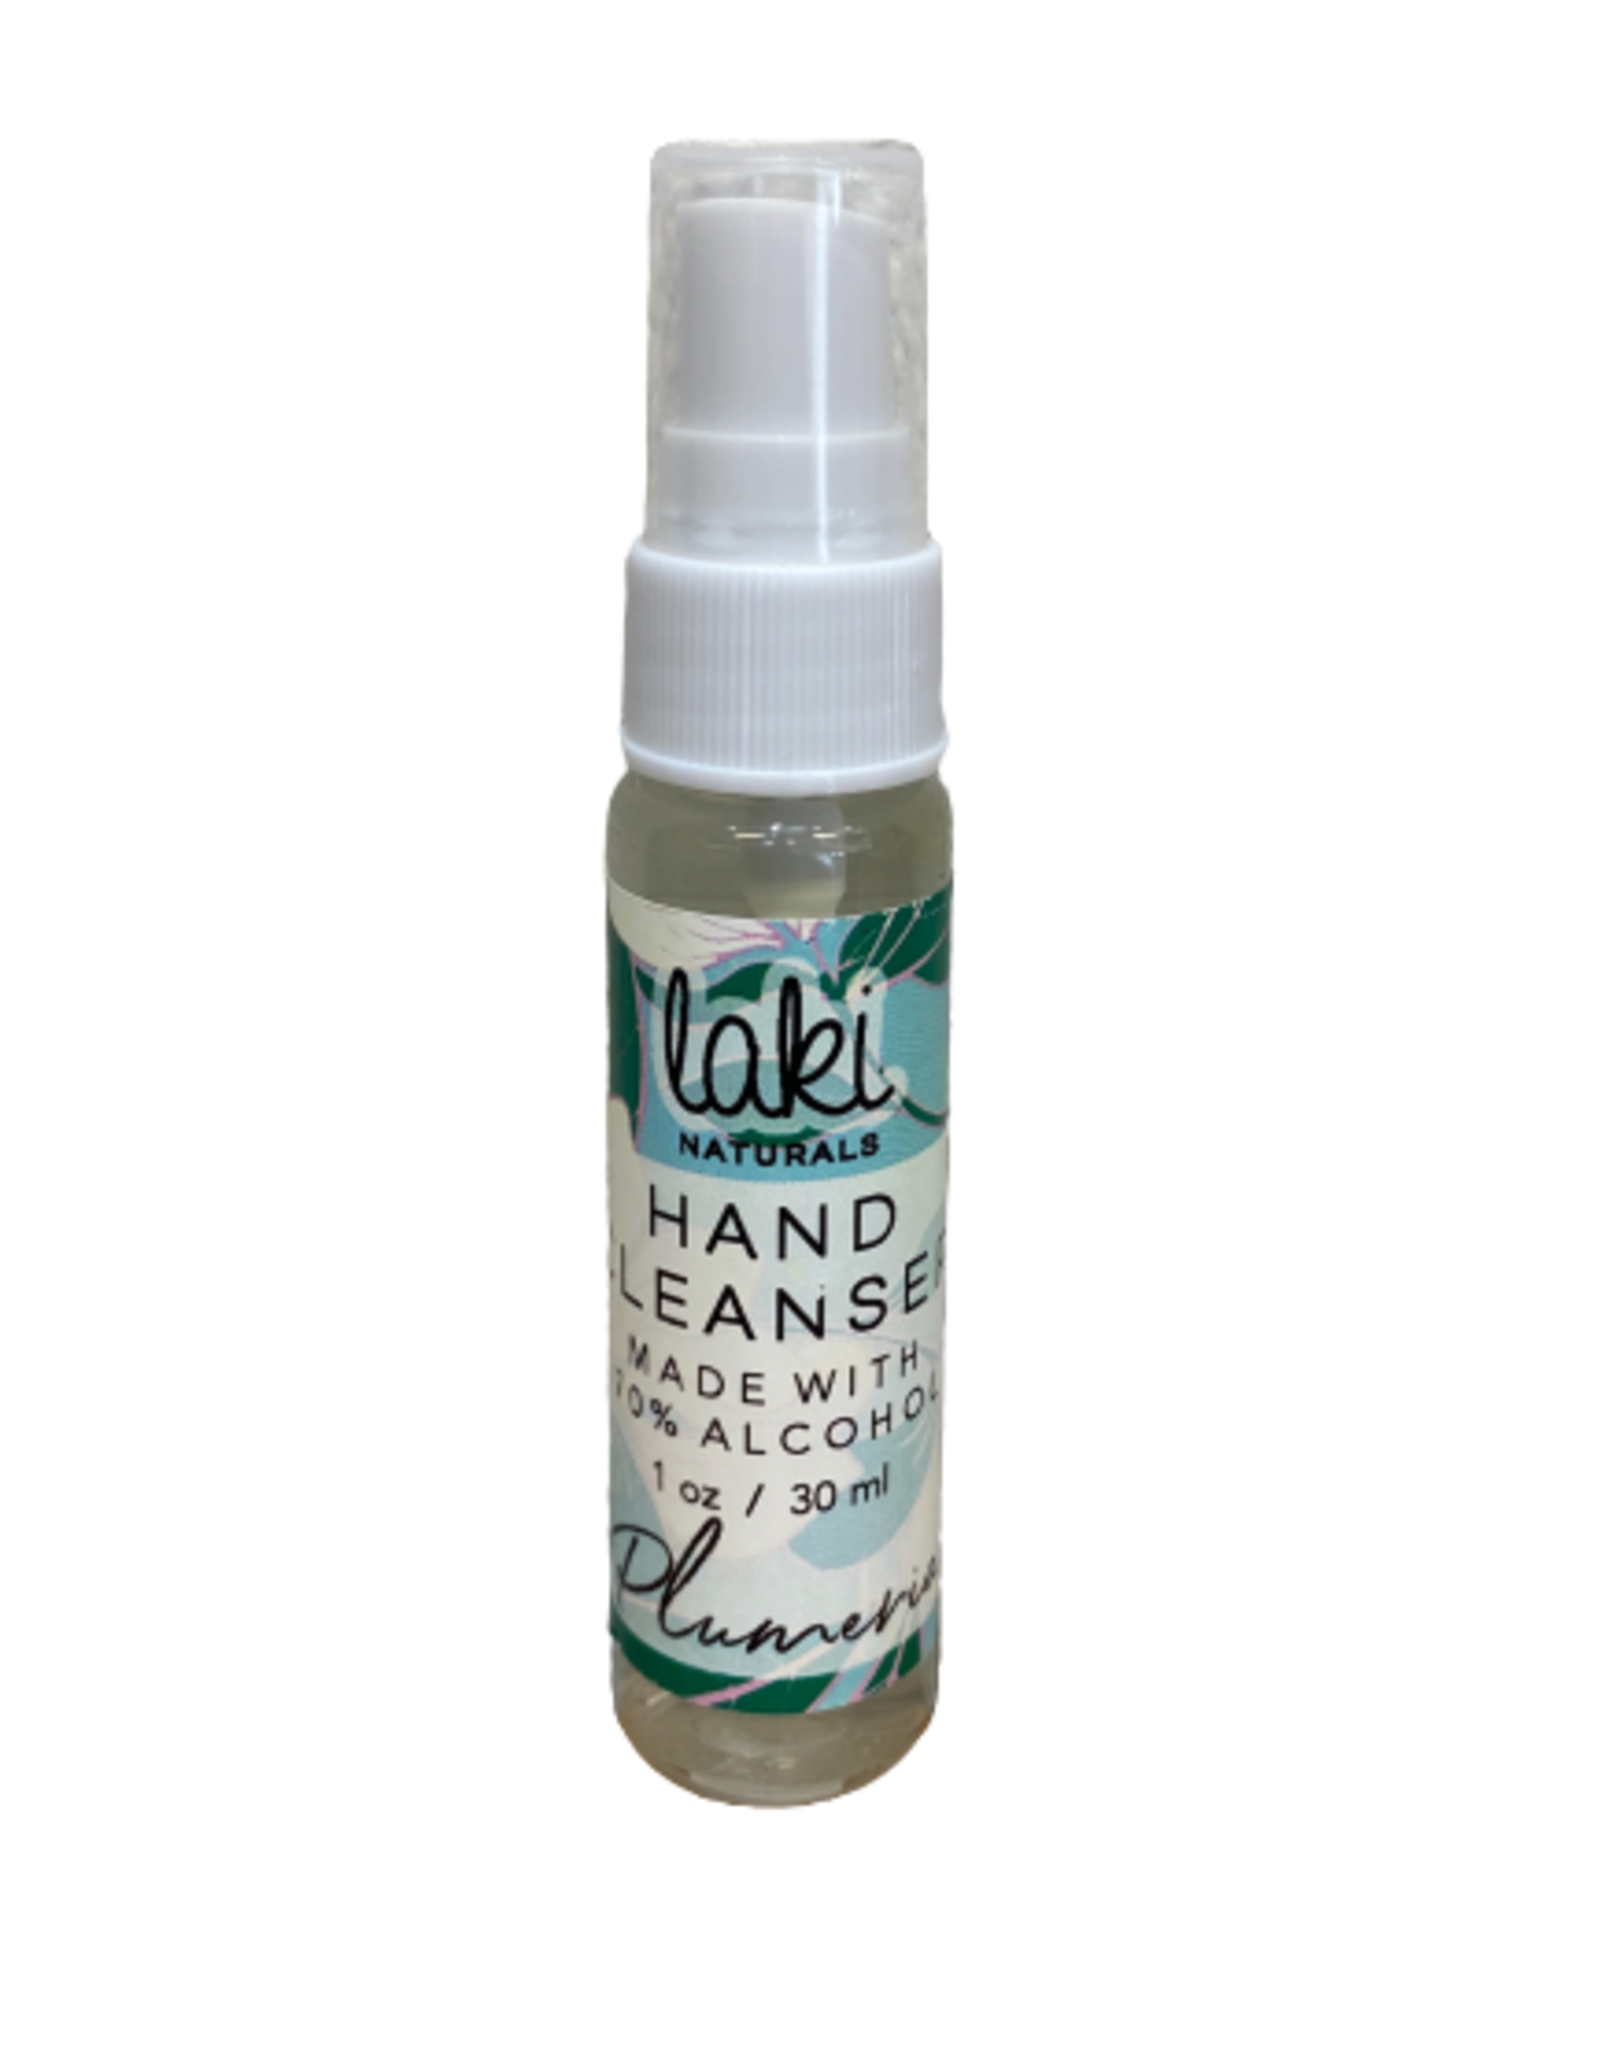 Laki Naturals Hand Cleanser